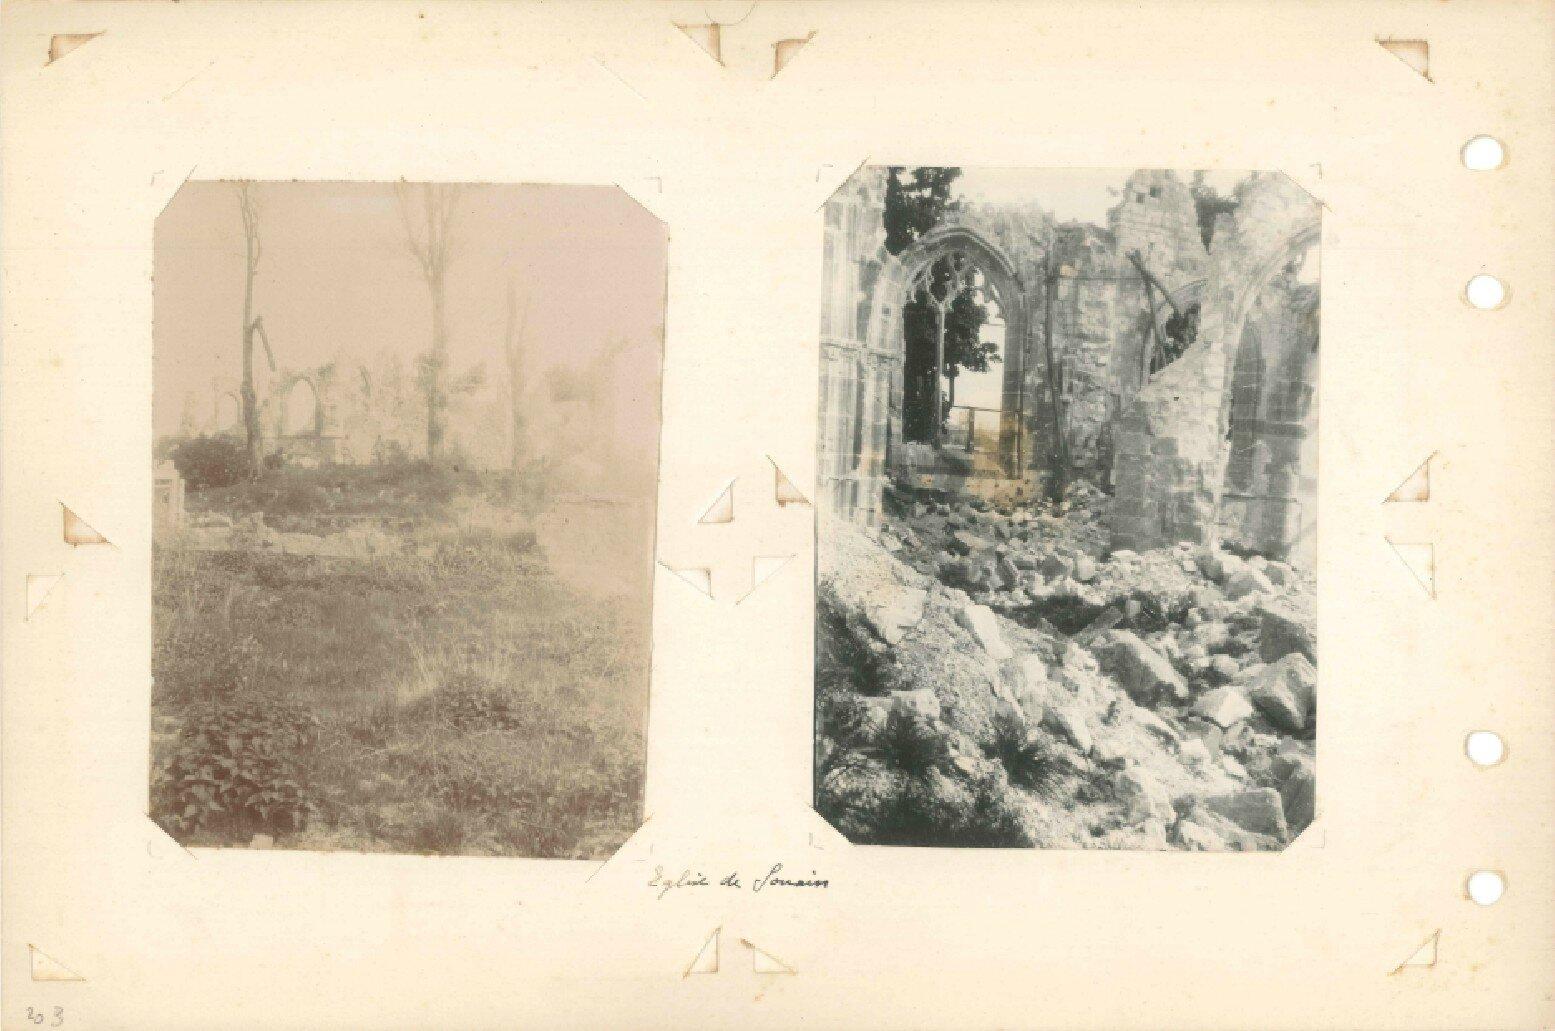 p.203 Secteur de Champagne 74e RI (14 mars – 25 mai 1918)